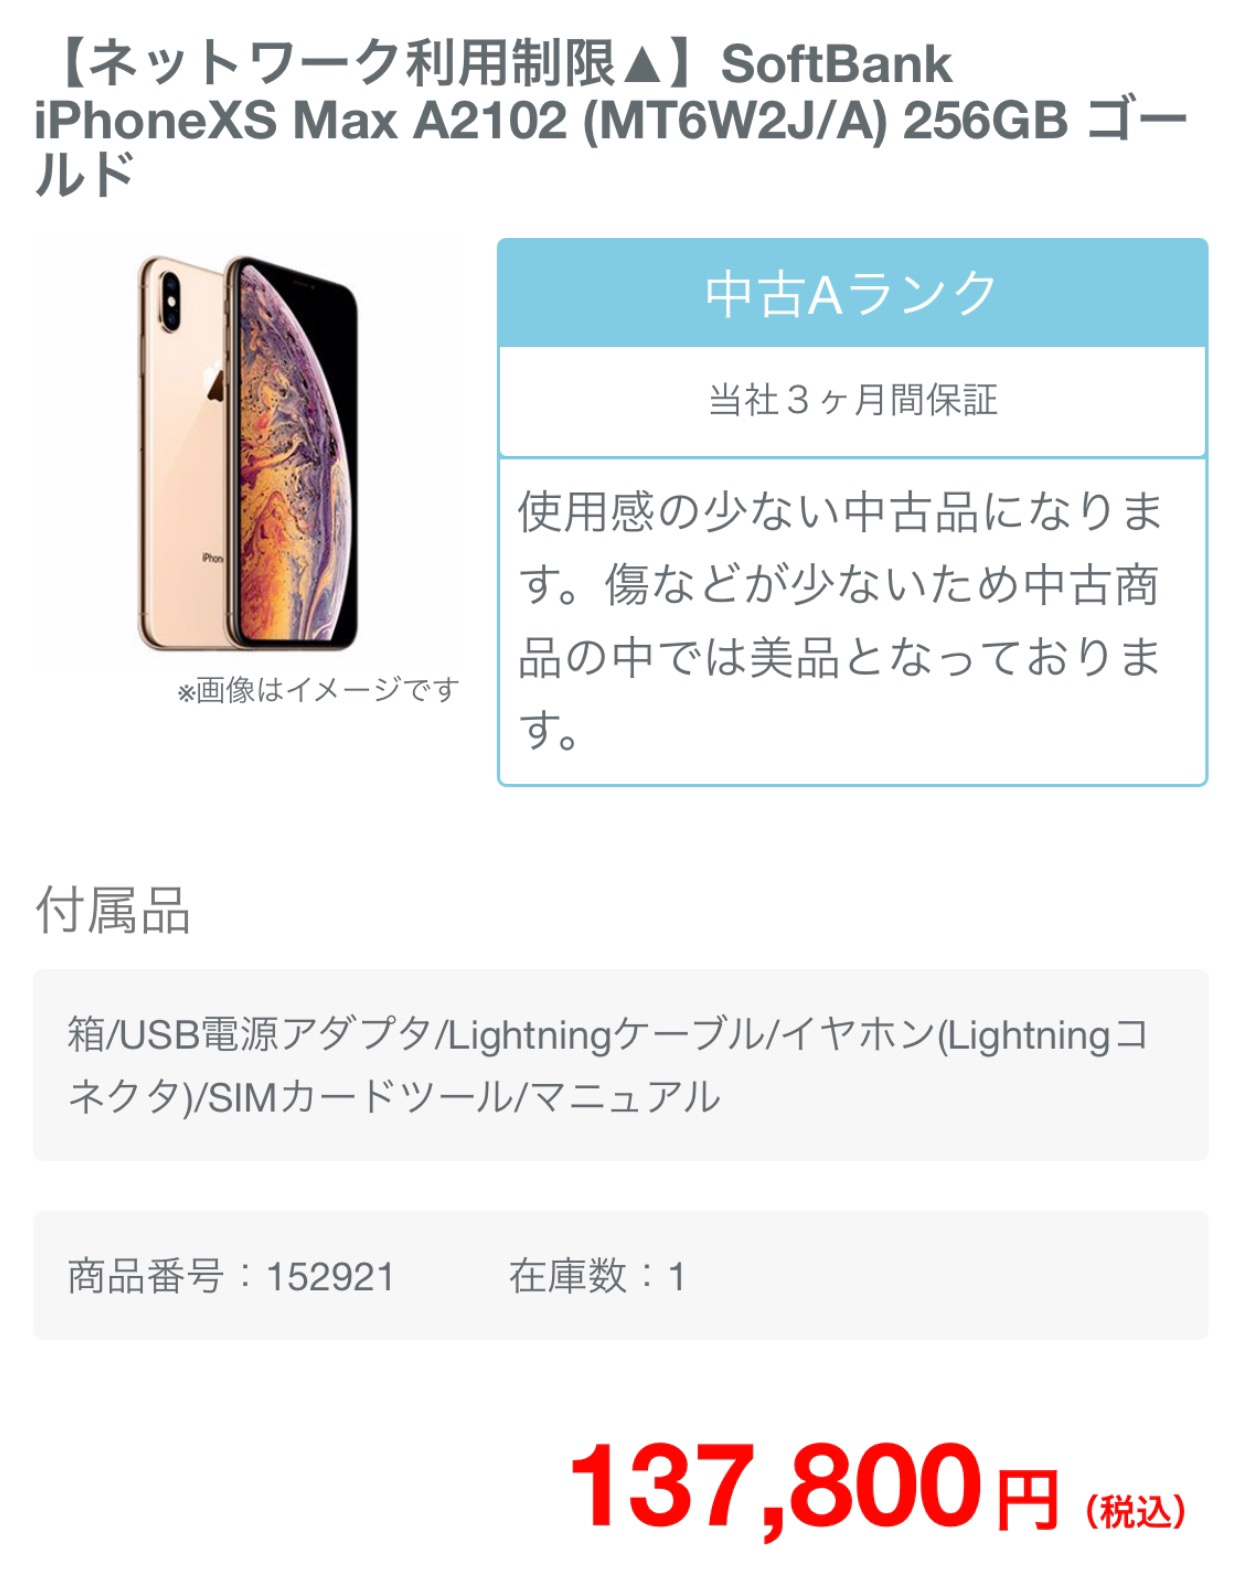 iPhone XS MaxはSIMフリー・docomo・au・ソフトバンク版のどのモデルを買うべきか?